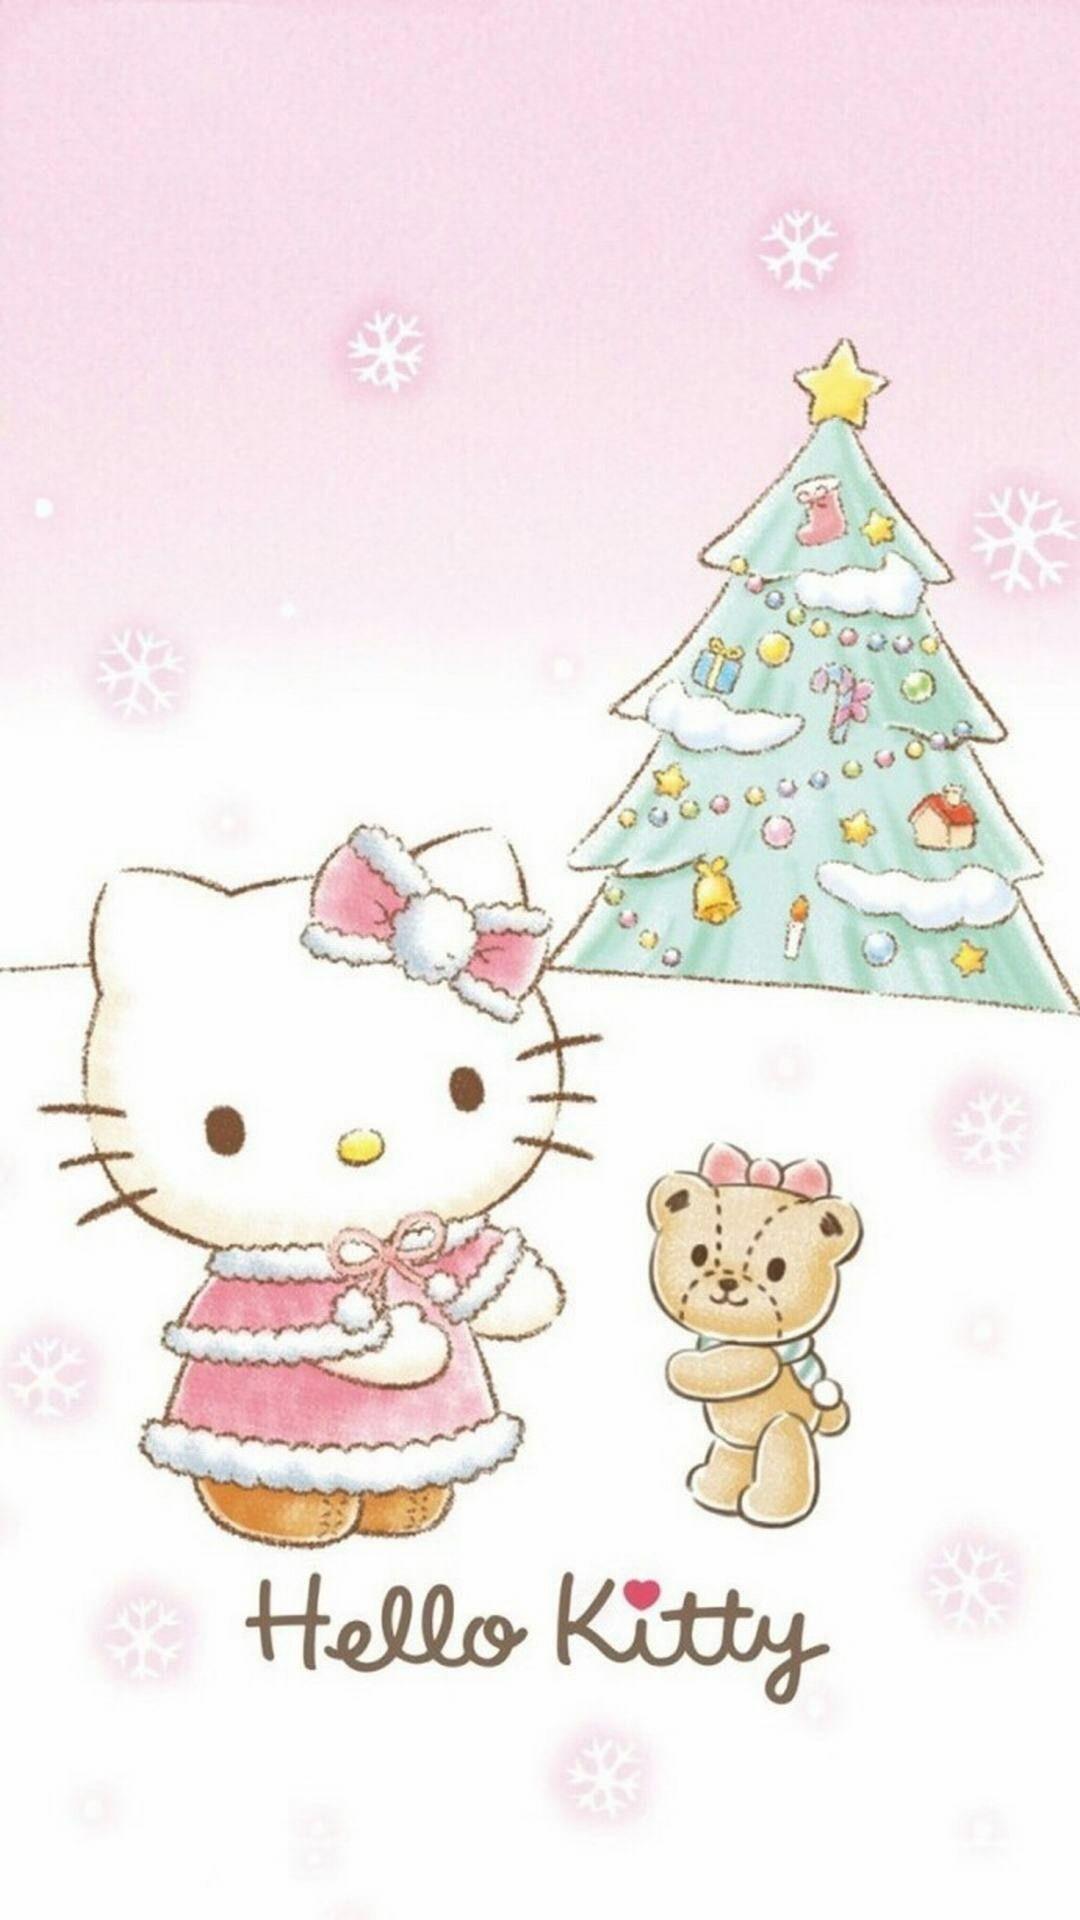 Hello Kitty Et Tiny Chum Christmas Wallpaper Hello Kitty Backgrounds Hello Kitty Pictures Hello Kitty Wallpaper